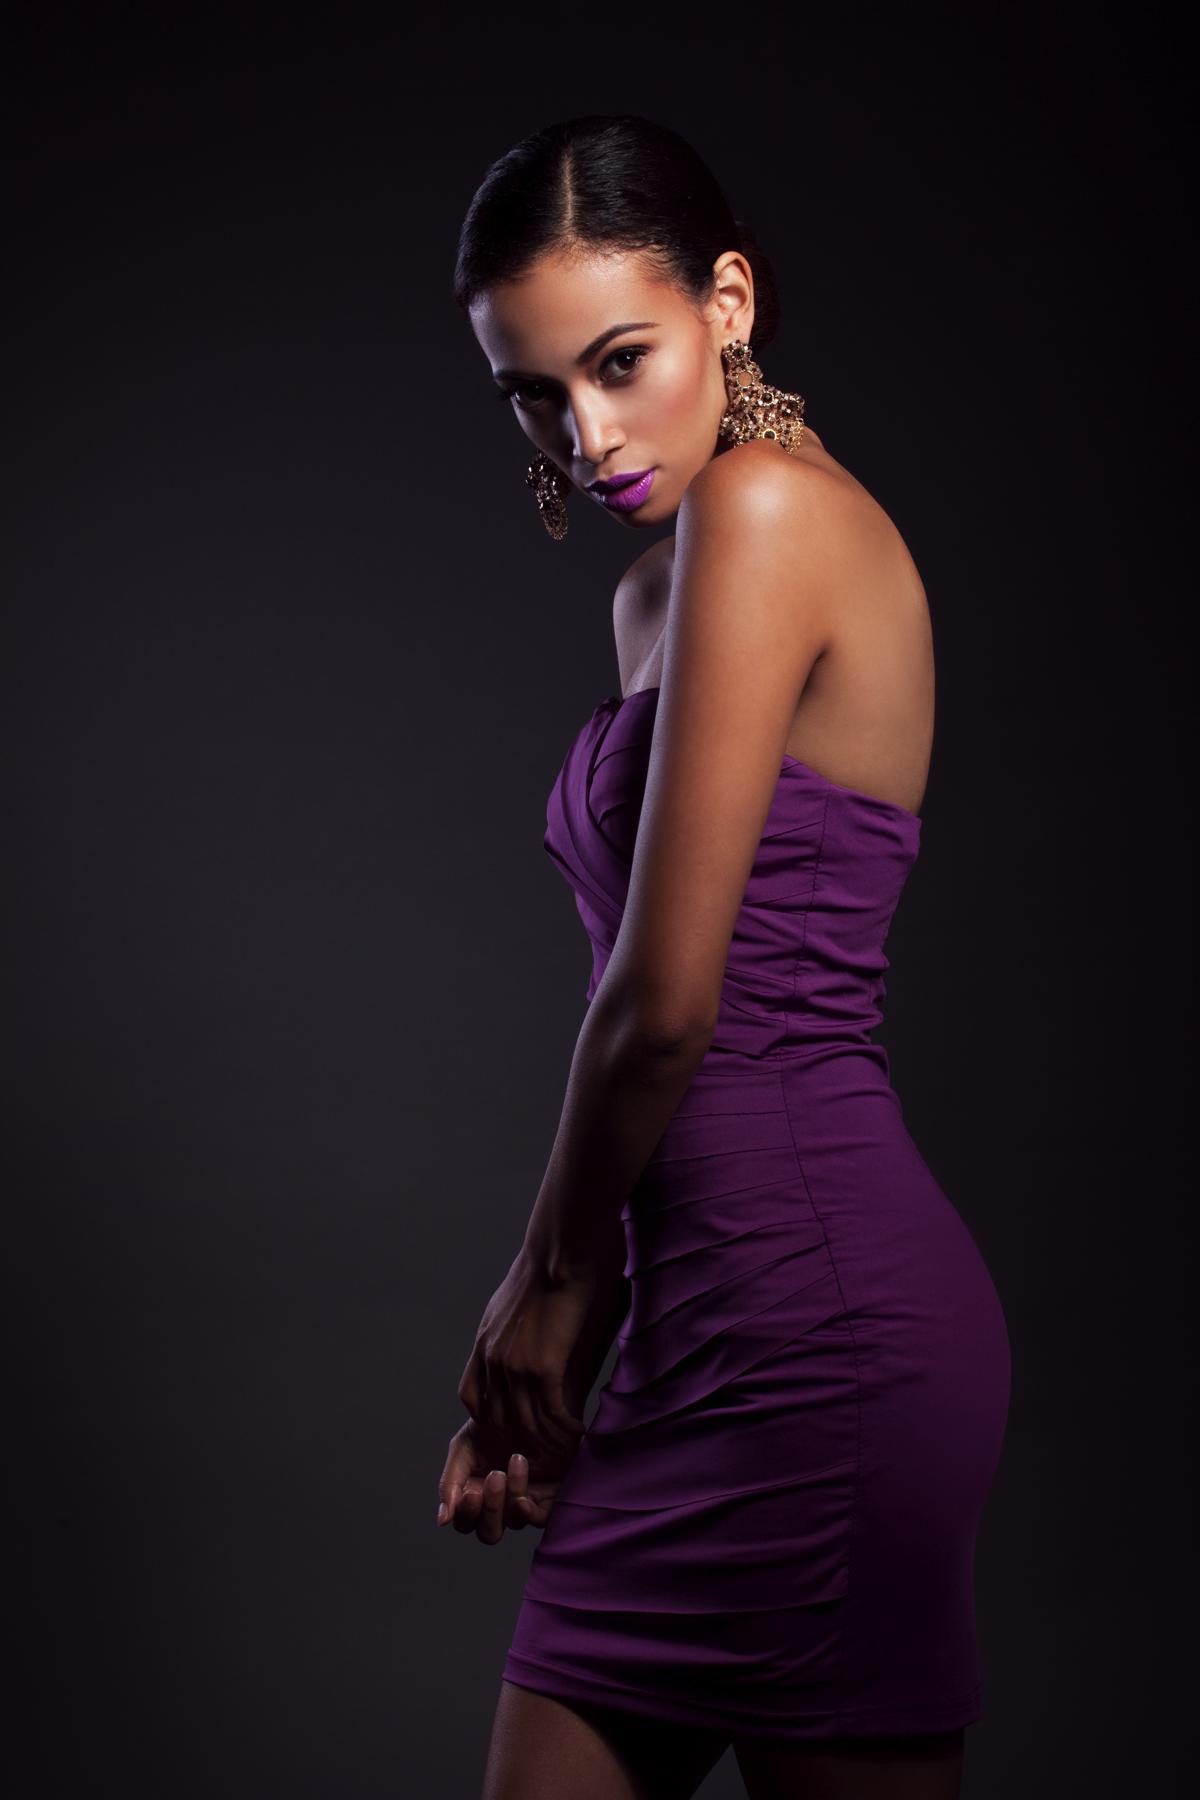 Lavender Makeup